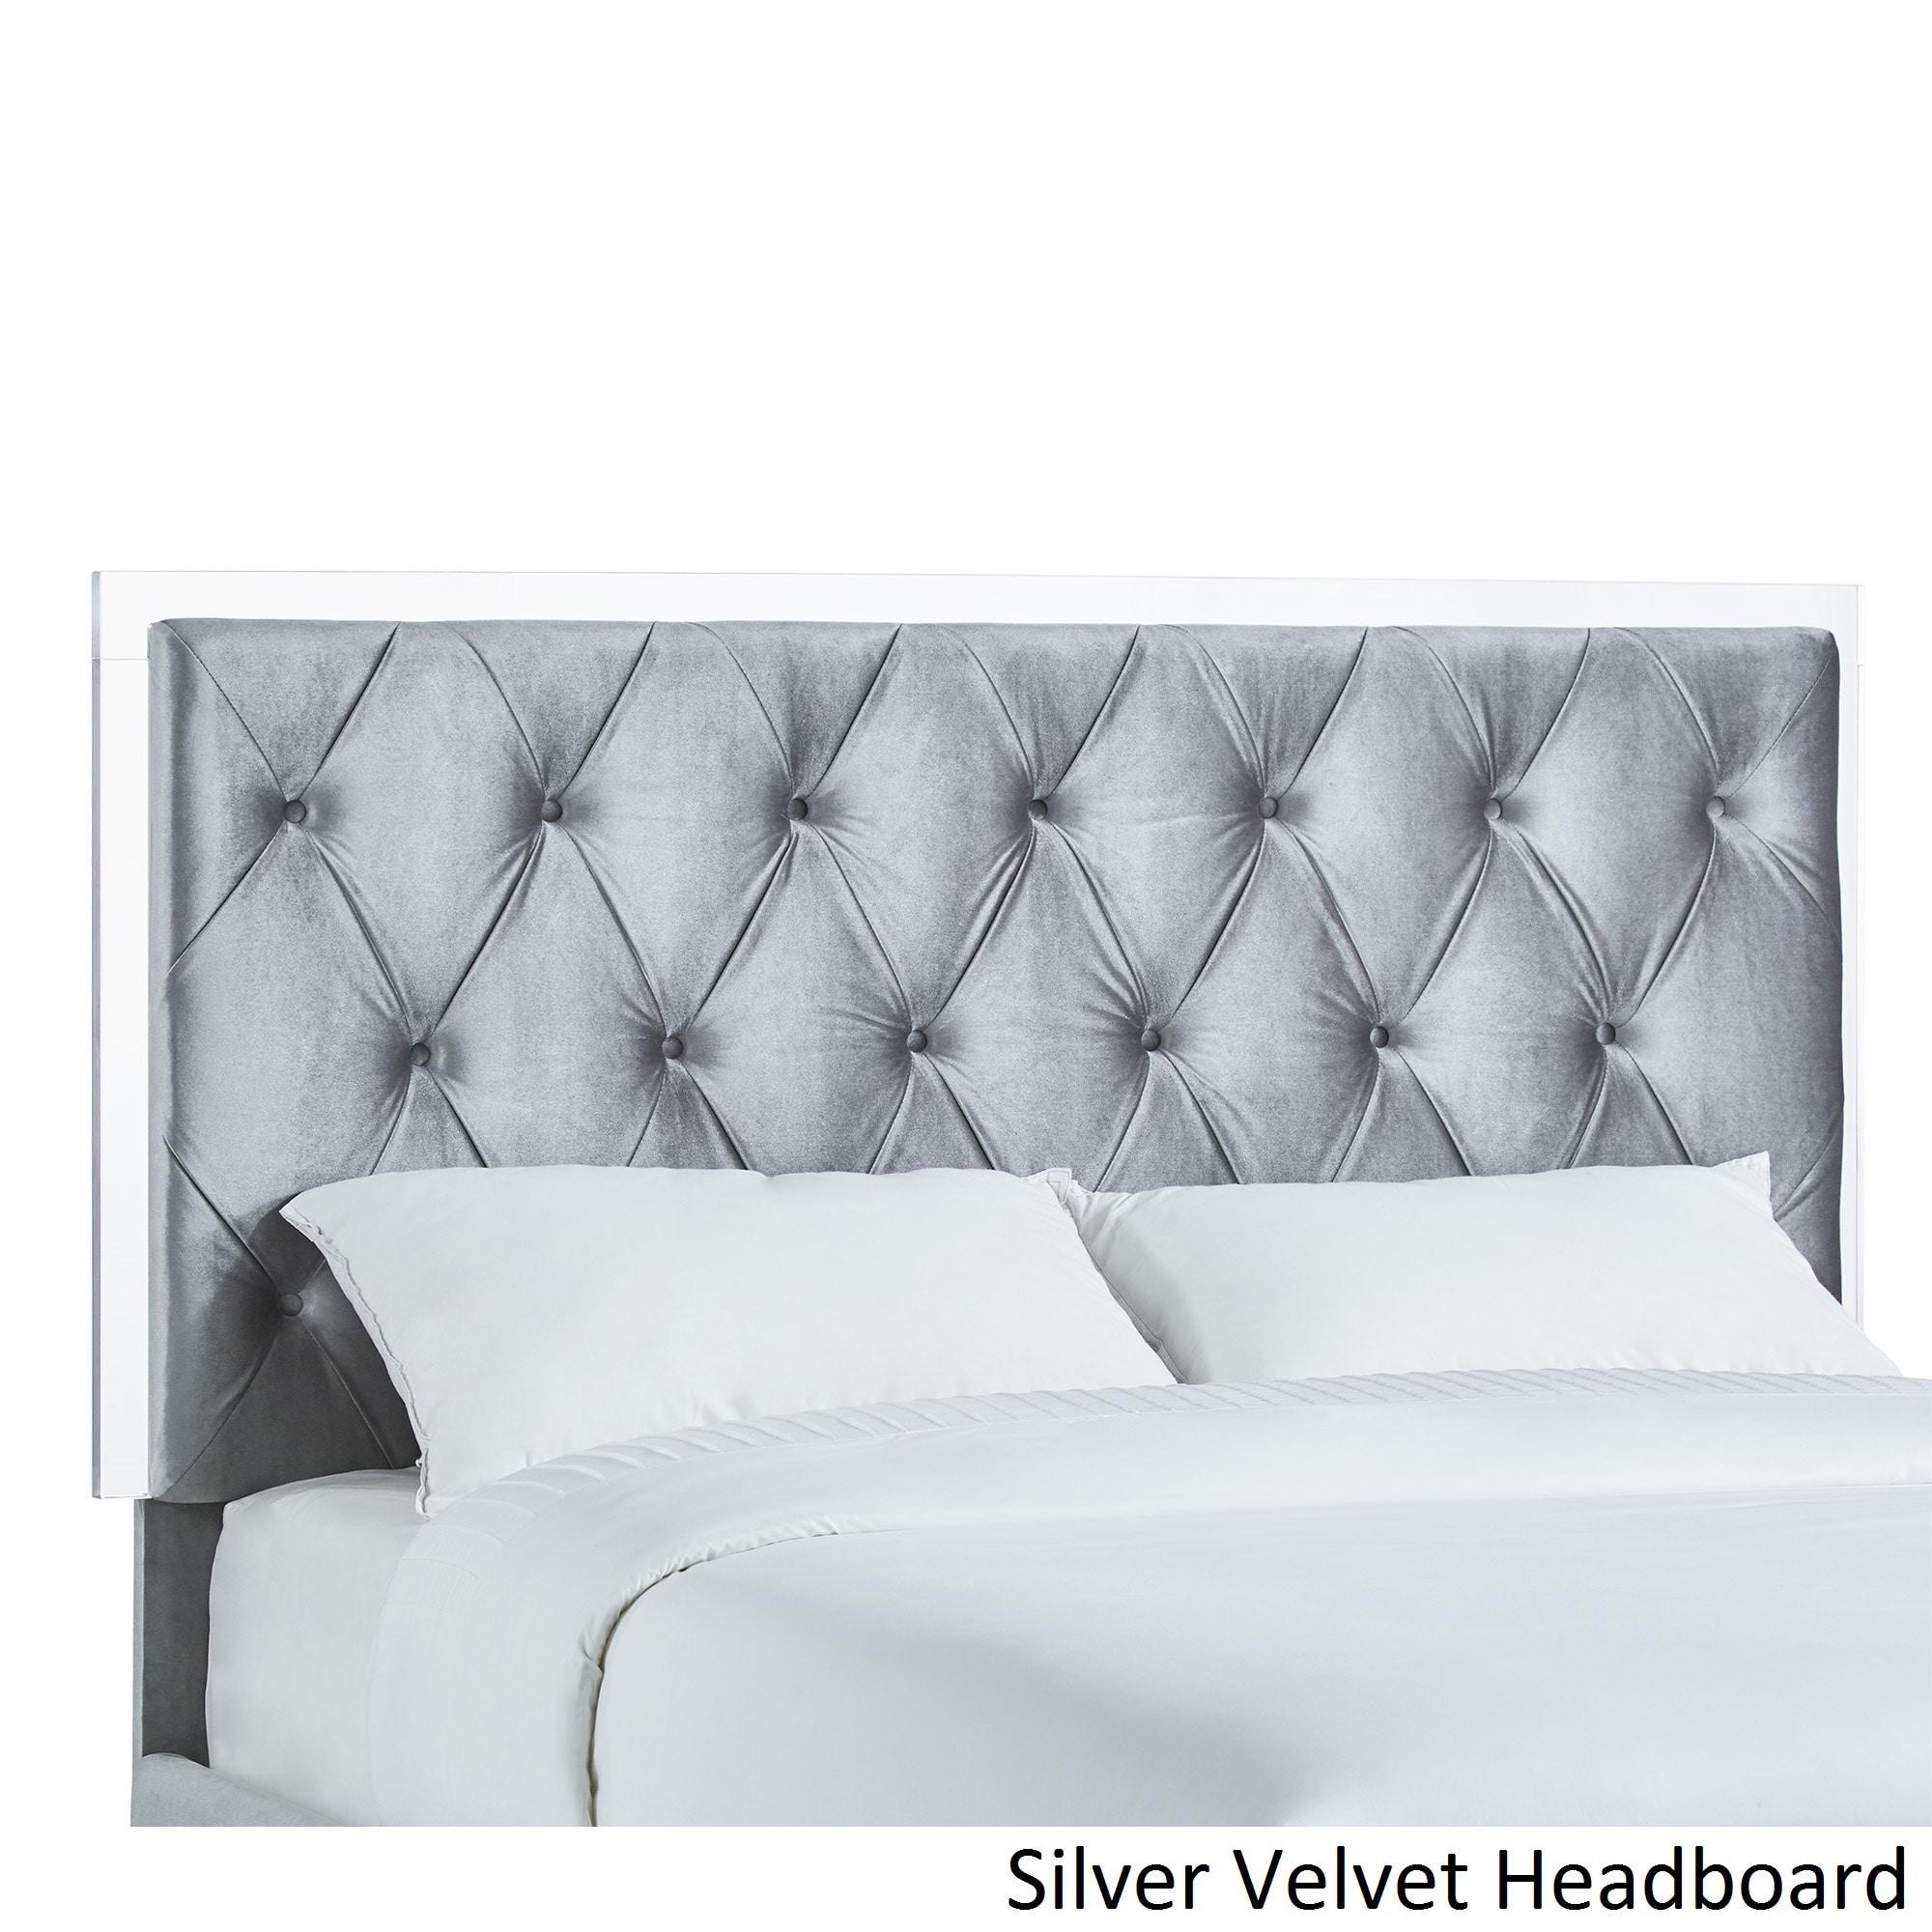 Anya Queen-size Velvet Button Tufted Acrylic Headboard an...